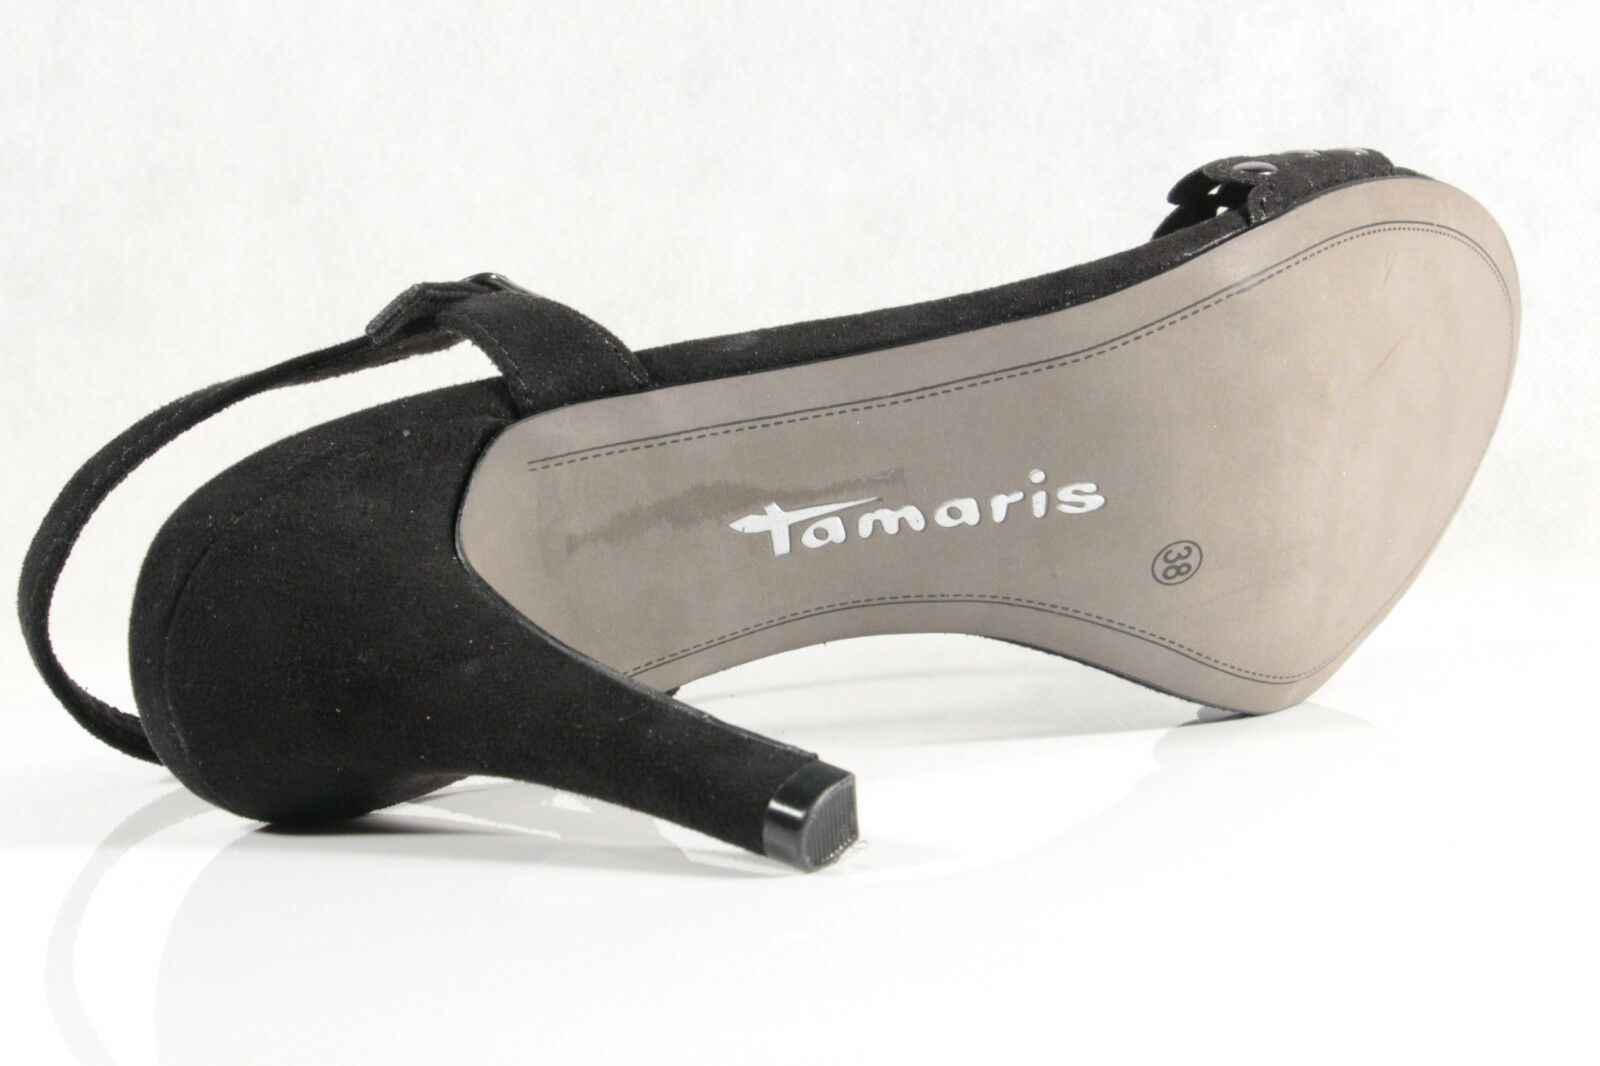 Señora Tamaris sandalia decorado negro, nuevo!